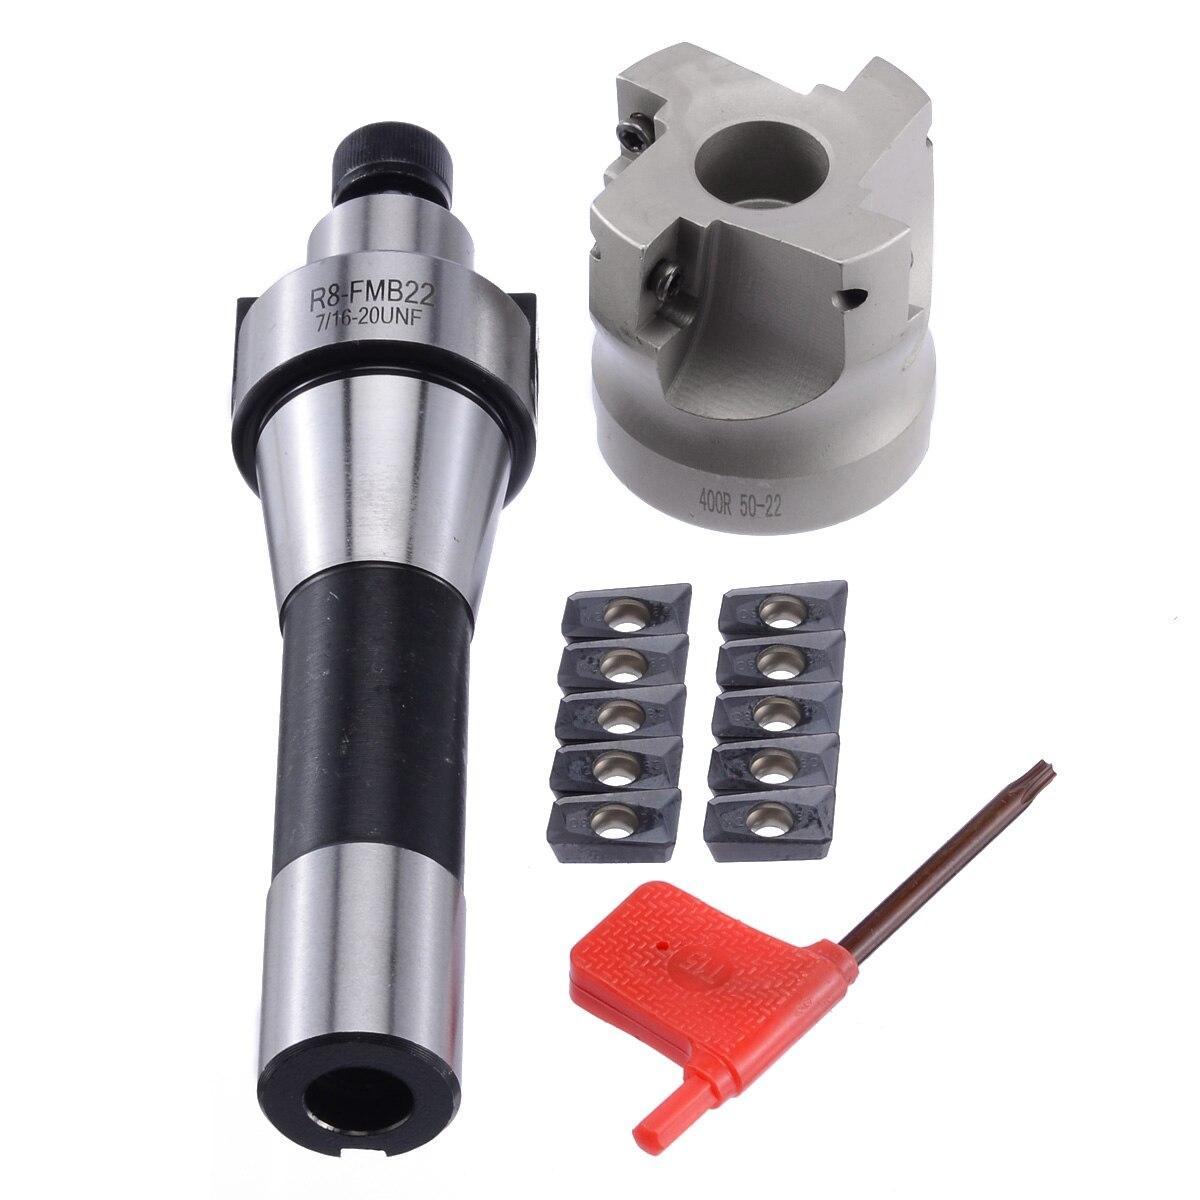 400R 50MM Milling CNC Face End Mill Cutter Kit 10pcs APMT1604 Carbide Inserts R8 Shank Arbor